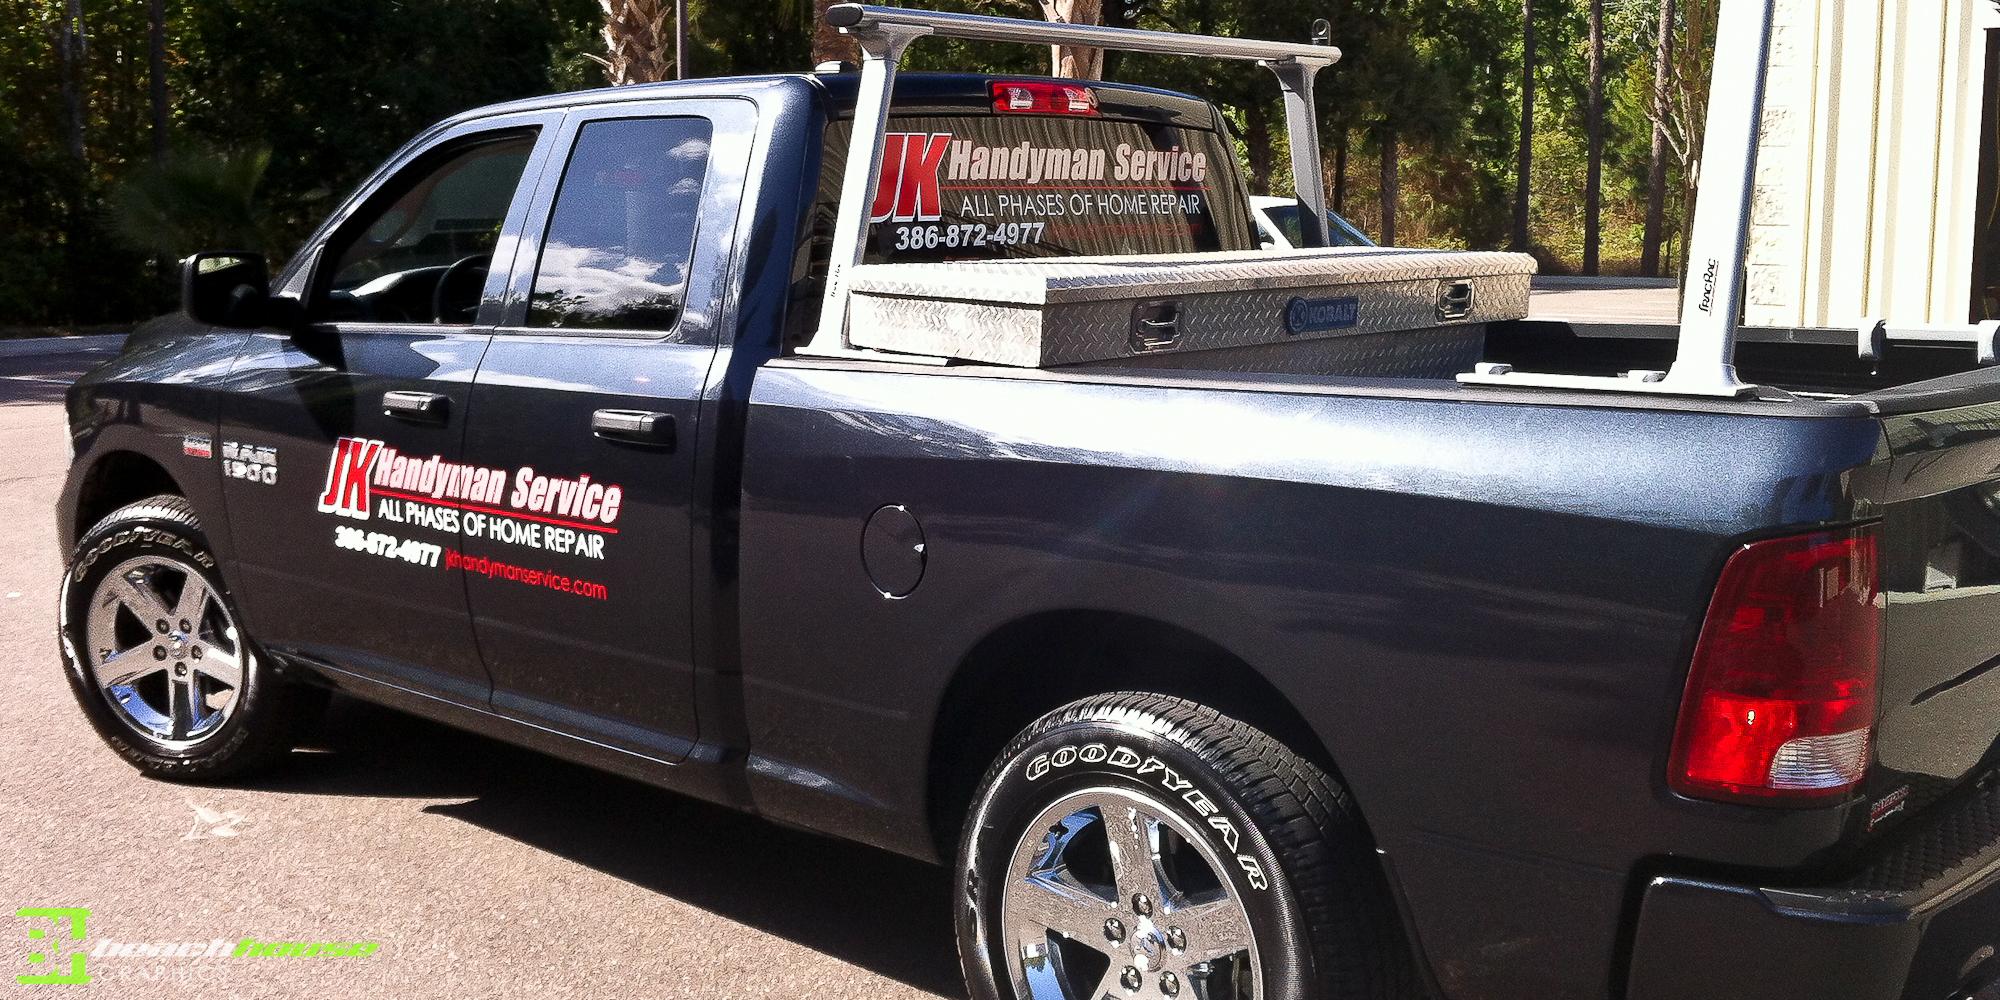 New Smyrna Dodge >> Daytona-Beach-Truck-Vinyl-Wrap-Graphics-New-Smyrna-Beach-3 | Custom Vehicle Wraps